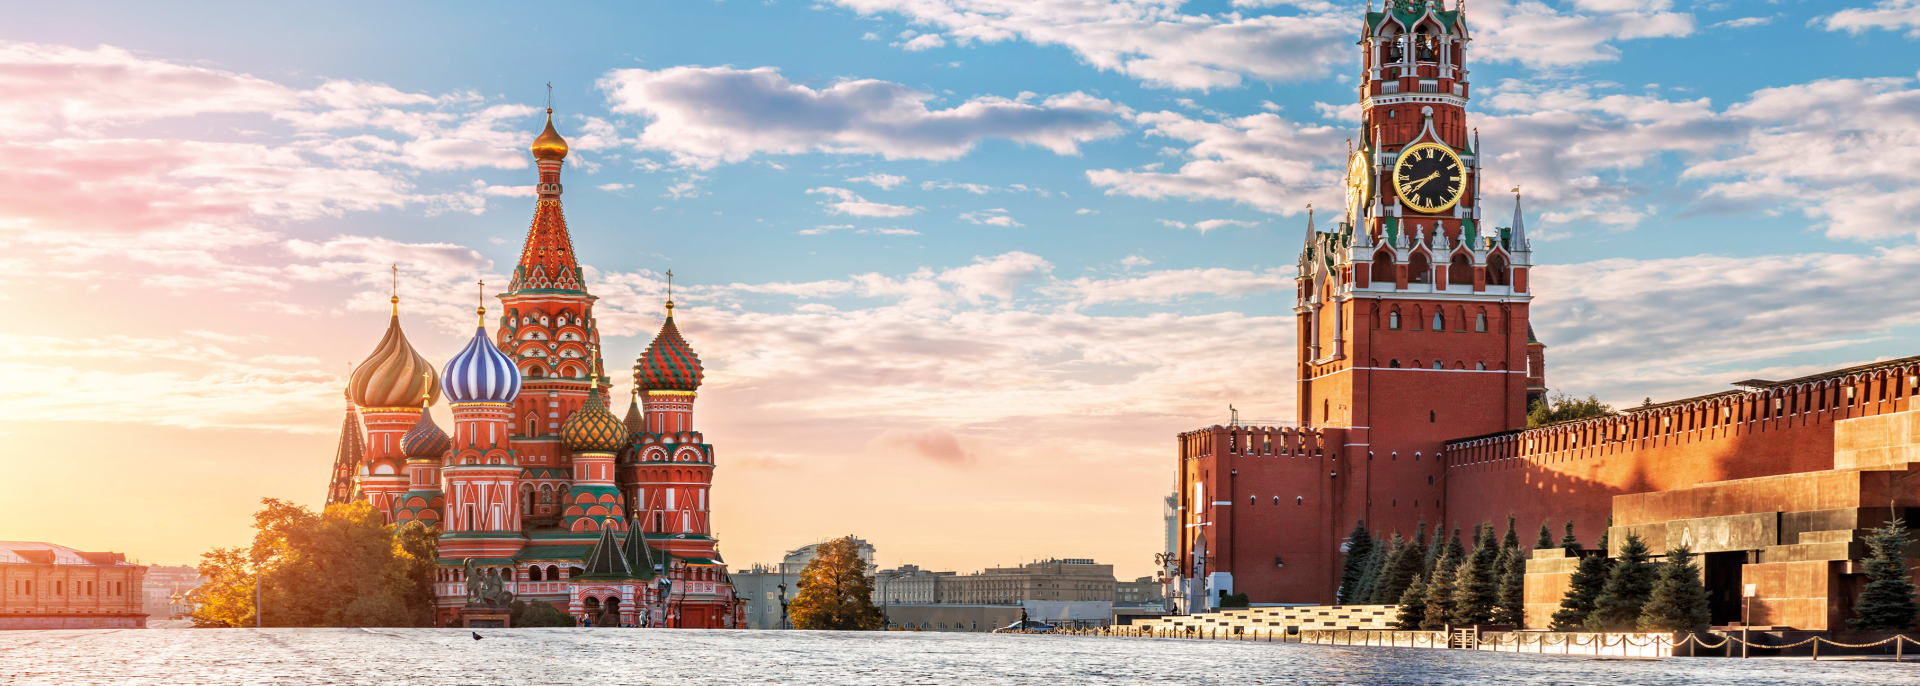 St. Basil Kathedrale und Spasskaya Turm, Moskau, Russland